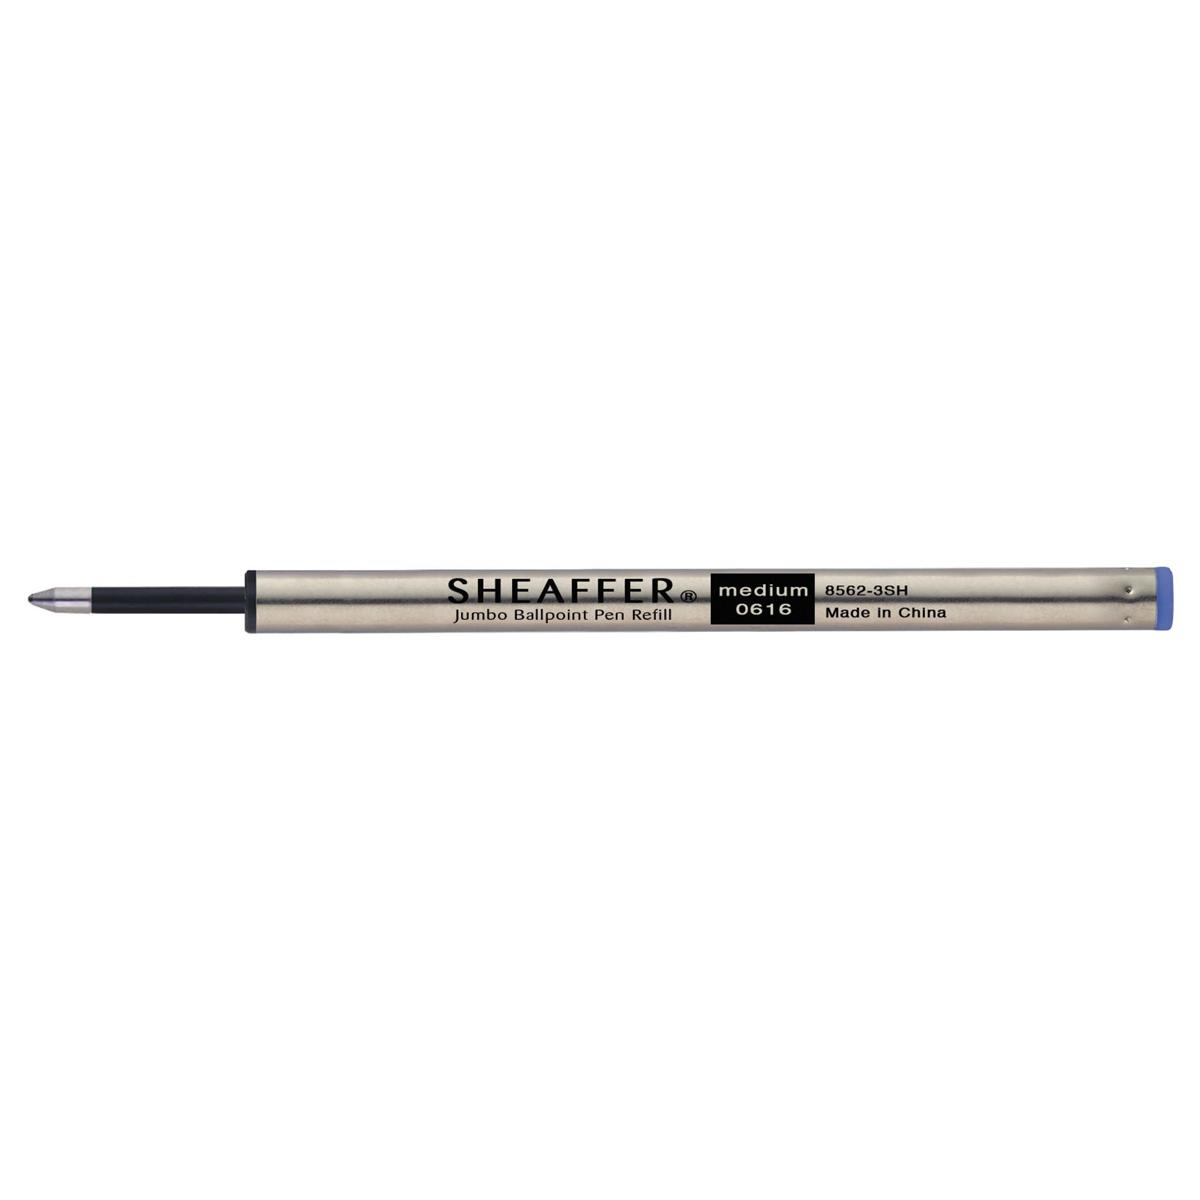 Carga Esfero Jumbo Azul para caneta Cross  e Sheaffer 8562-3SH